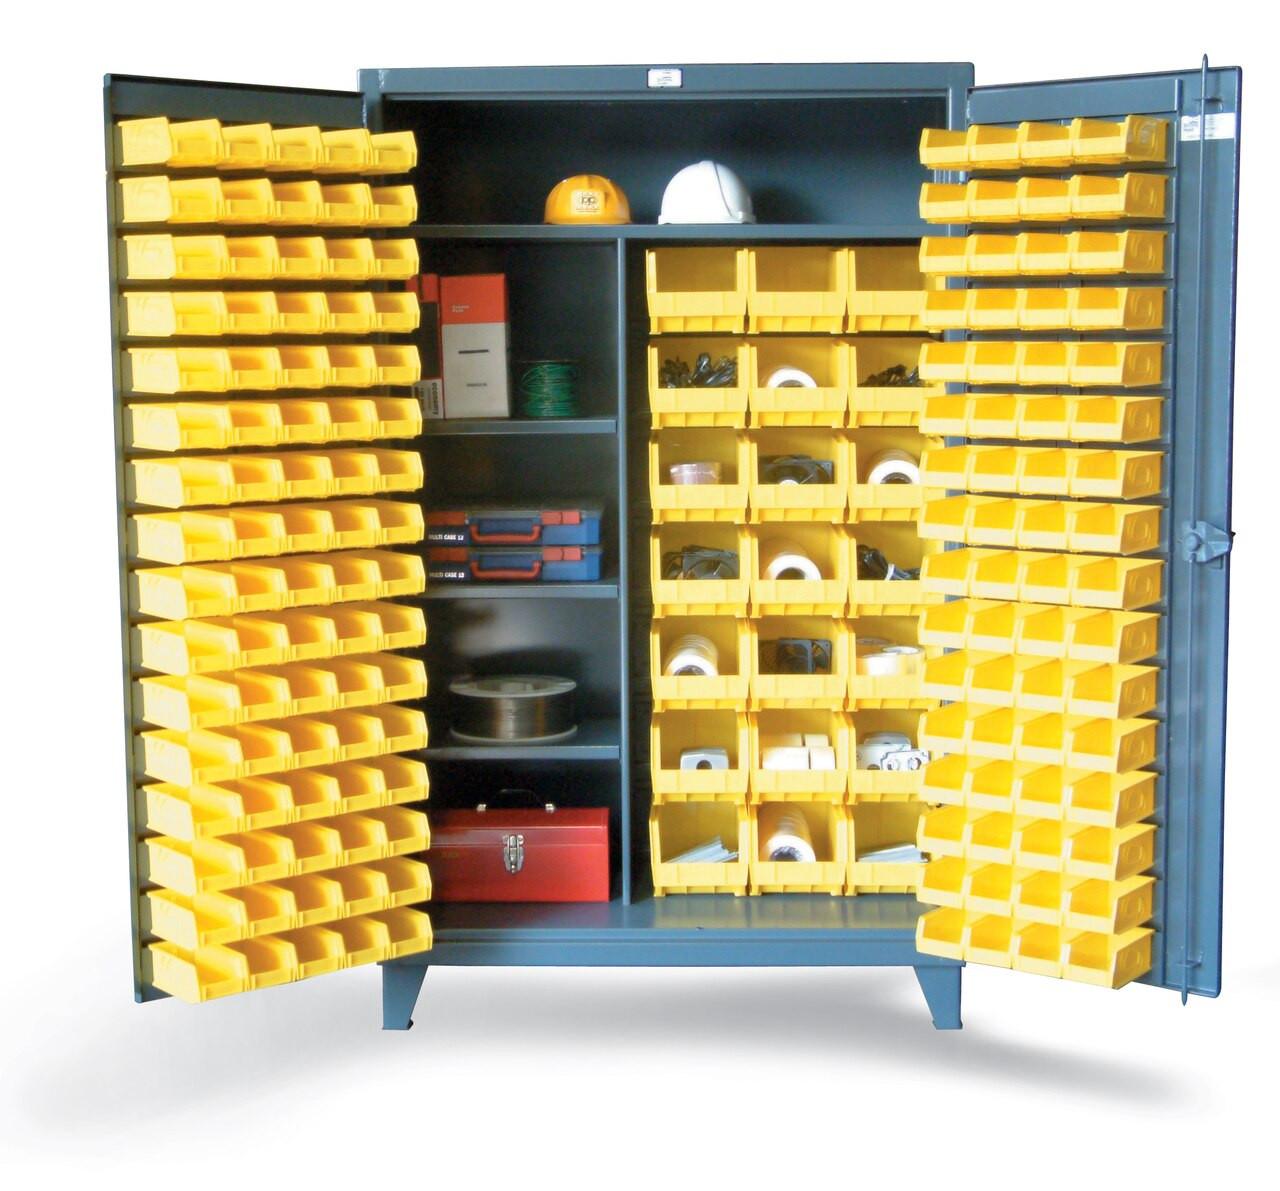 46 Bscw 241 3wlr Bin Storage Cabinet With Half Width Shelves 48